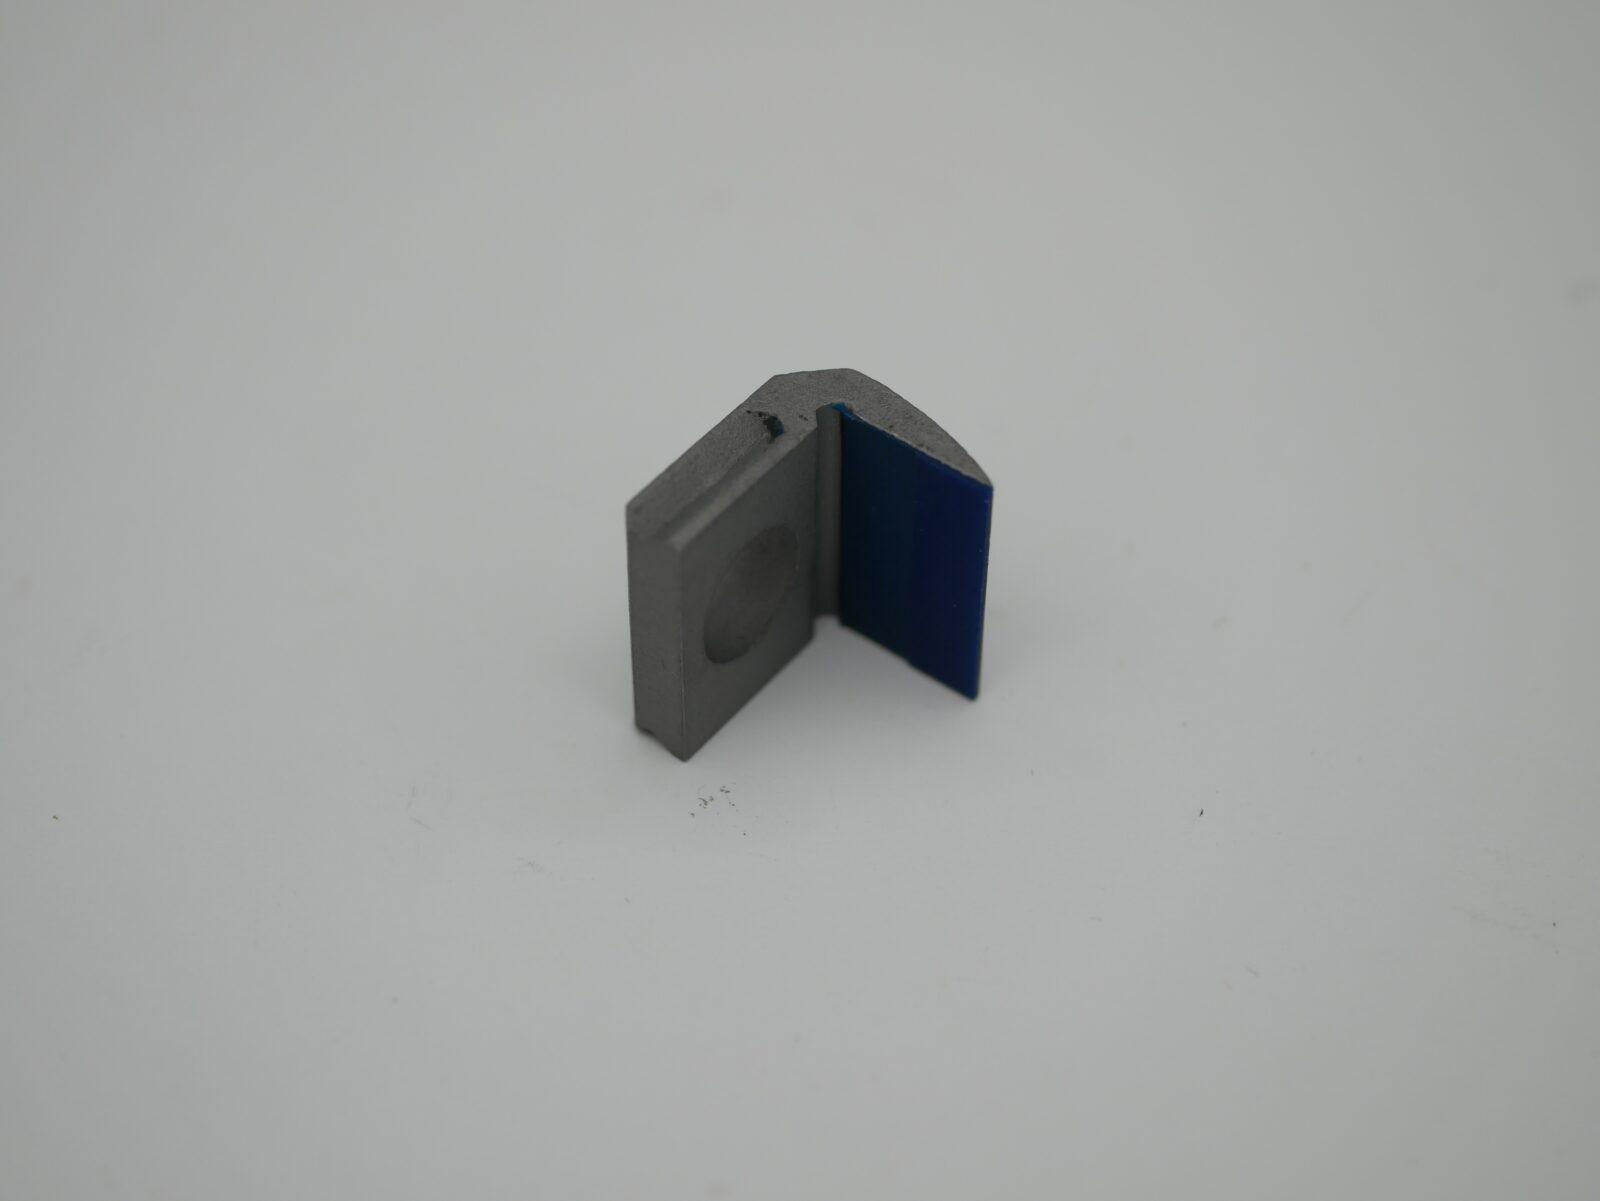 Impression Grippers Urethan Tip HDM: M4.011.727